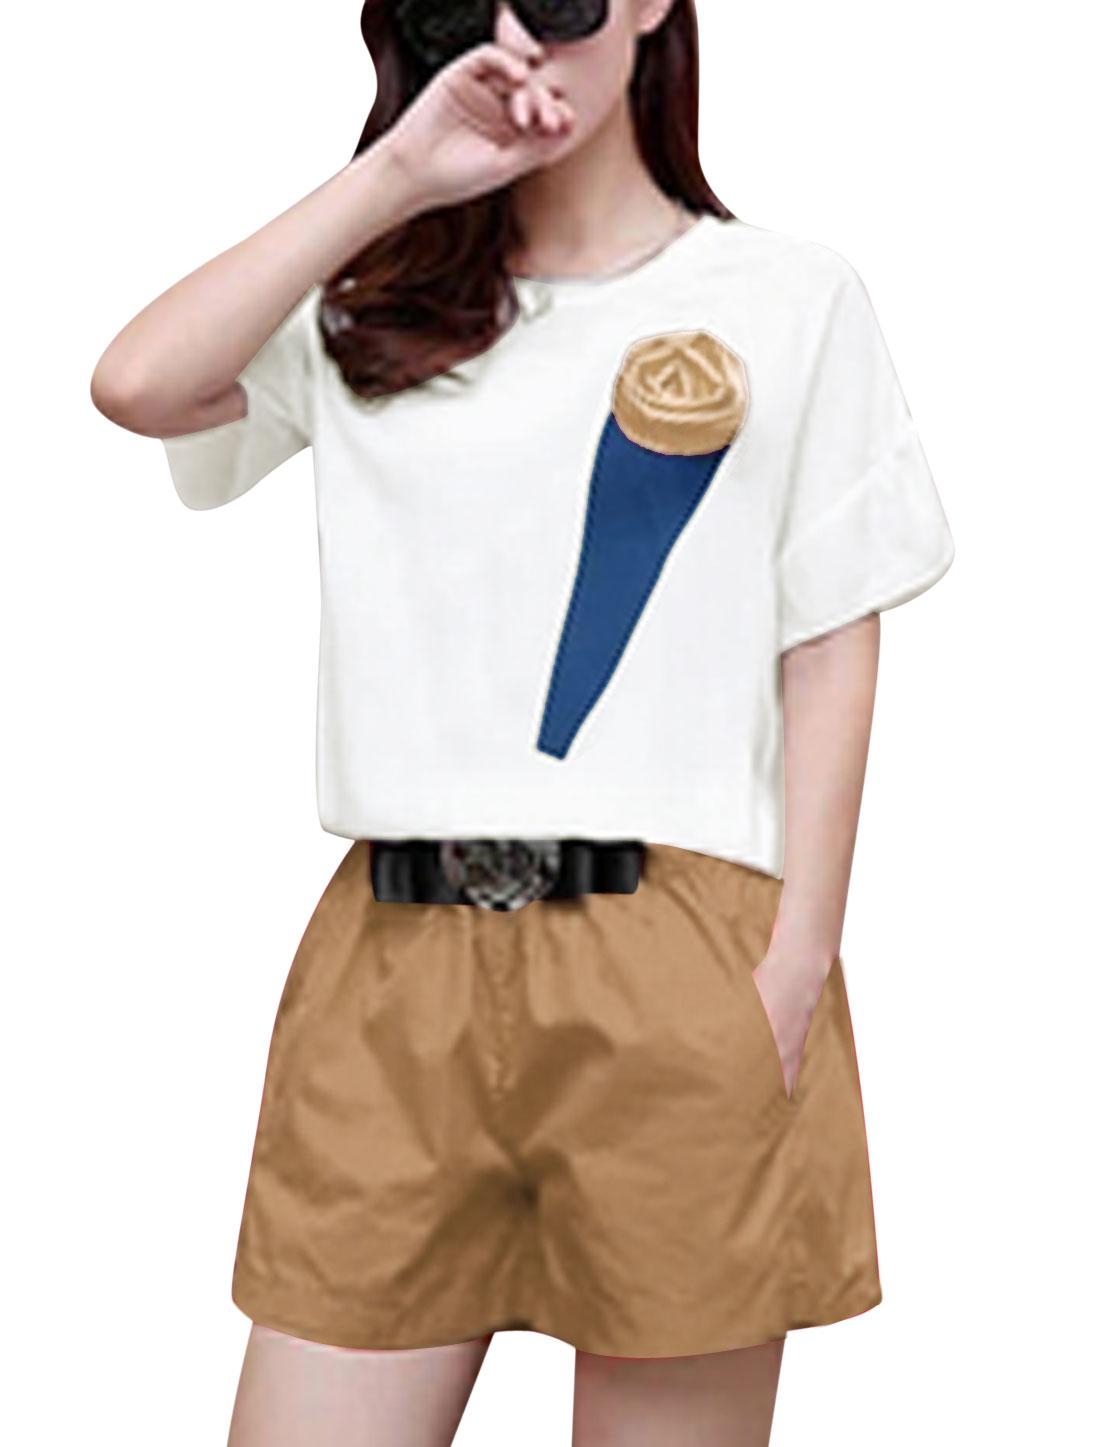 Lady Rose Decor White Top w Bowknot Metal Decor Casual Khaki Shorts S